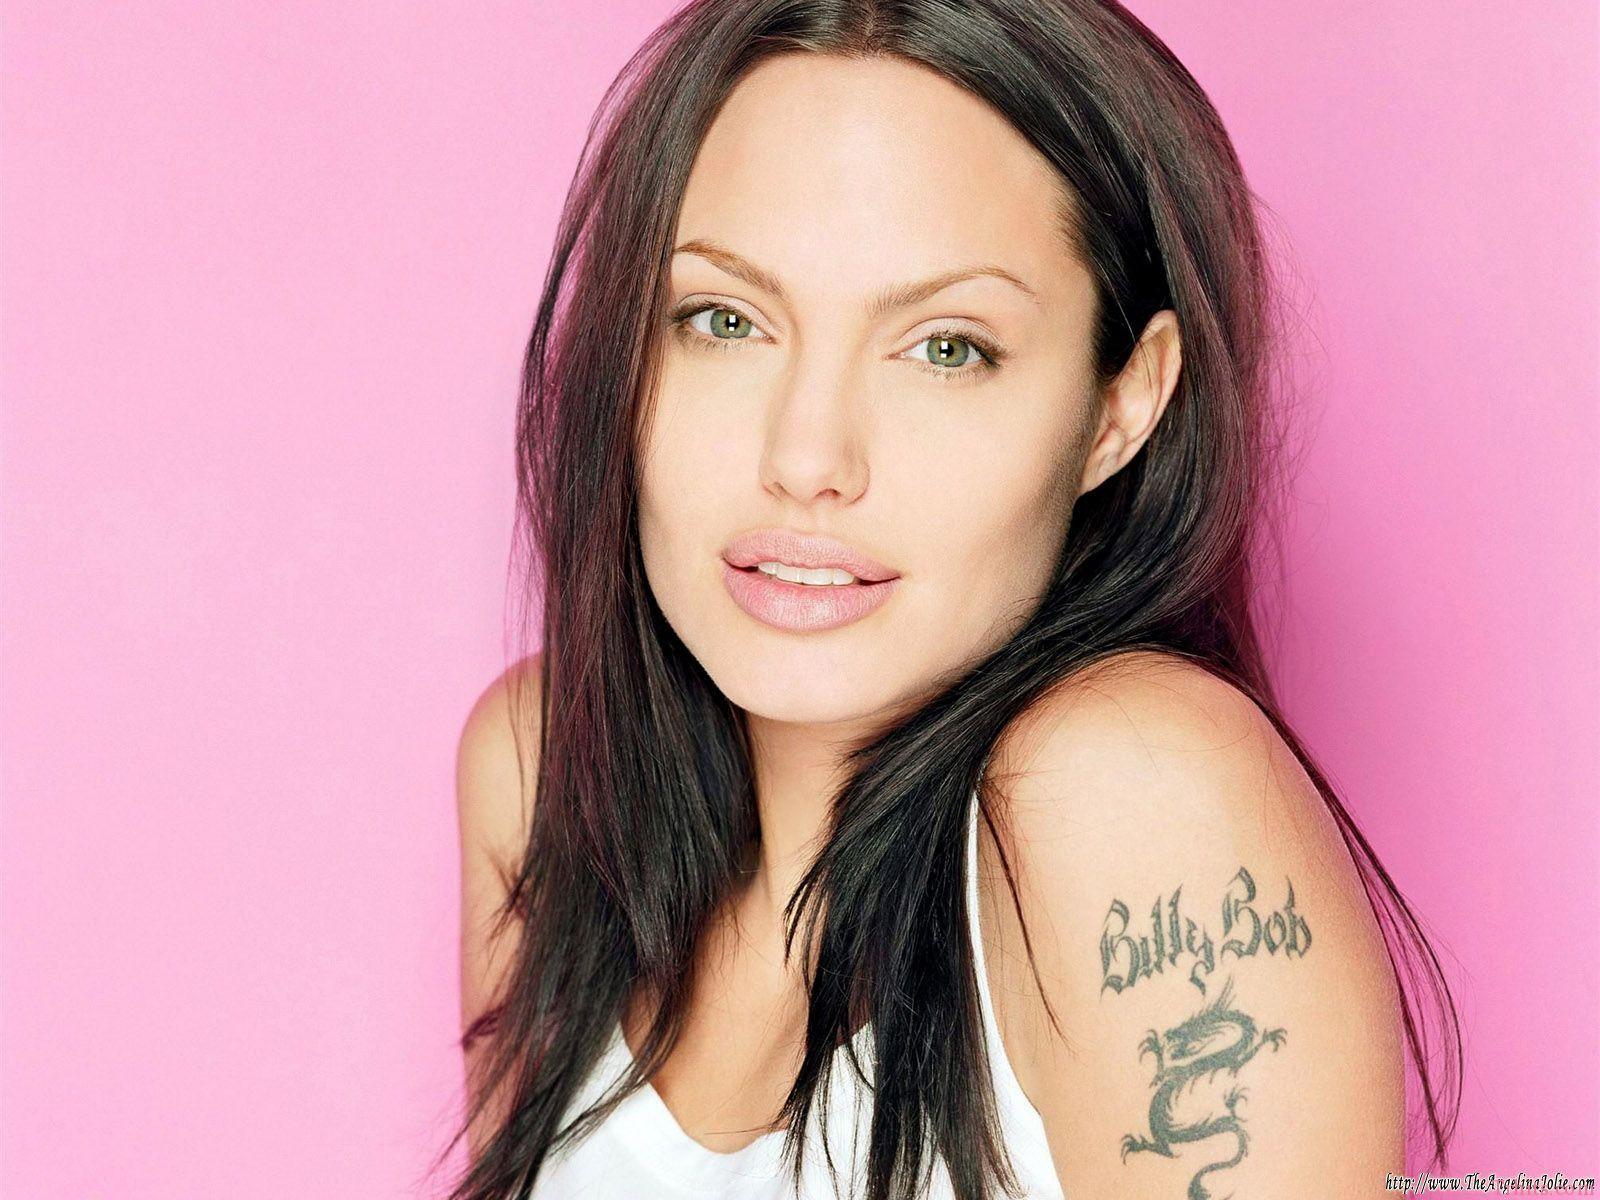 Tattoo Designs & Tattoos Meanings, Celebrity Tattoos ...